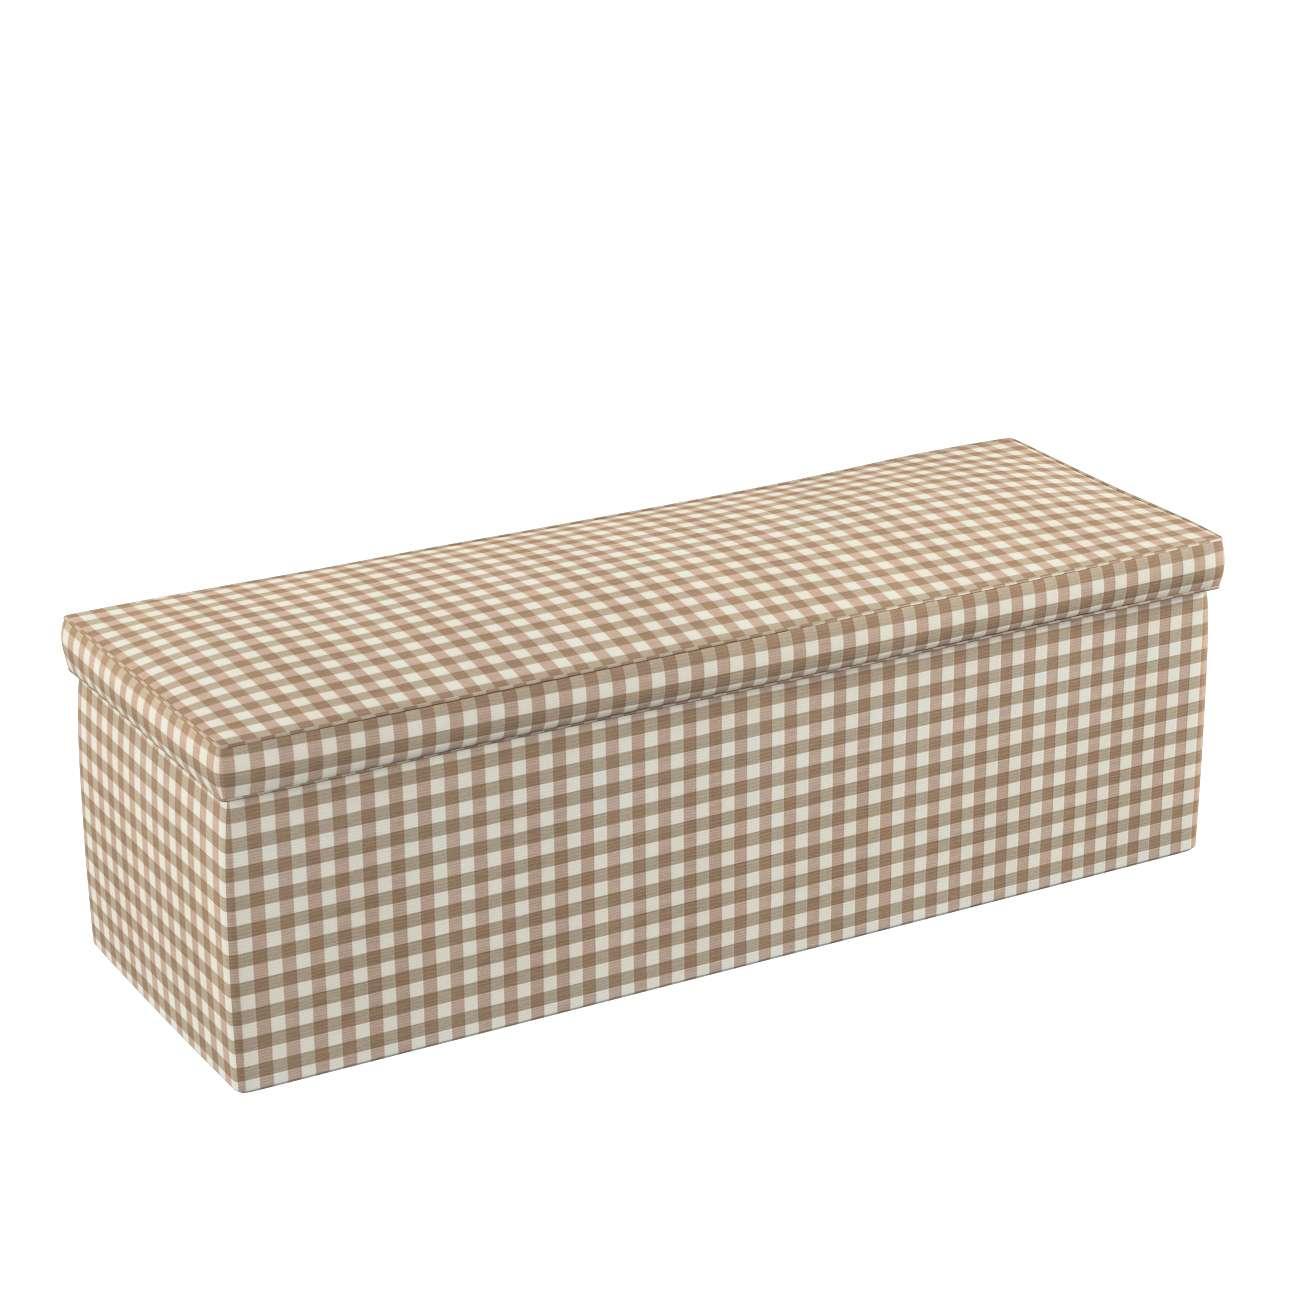 Dežė/skrynia/daiktadėžė 90 x 40 x 40 cm kolekcijoje Quadro, audinys: 136-06